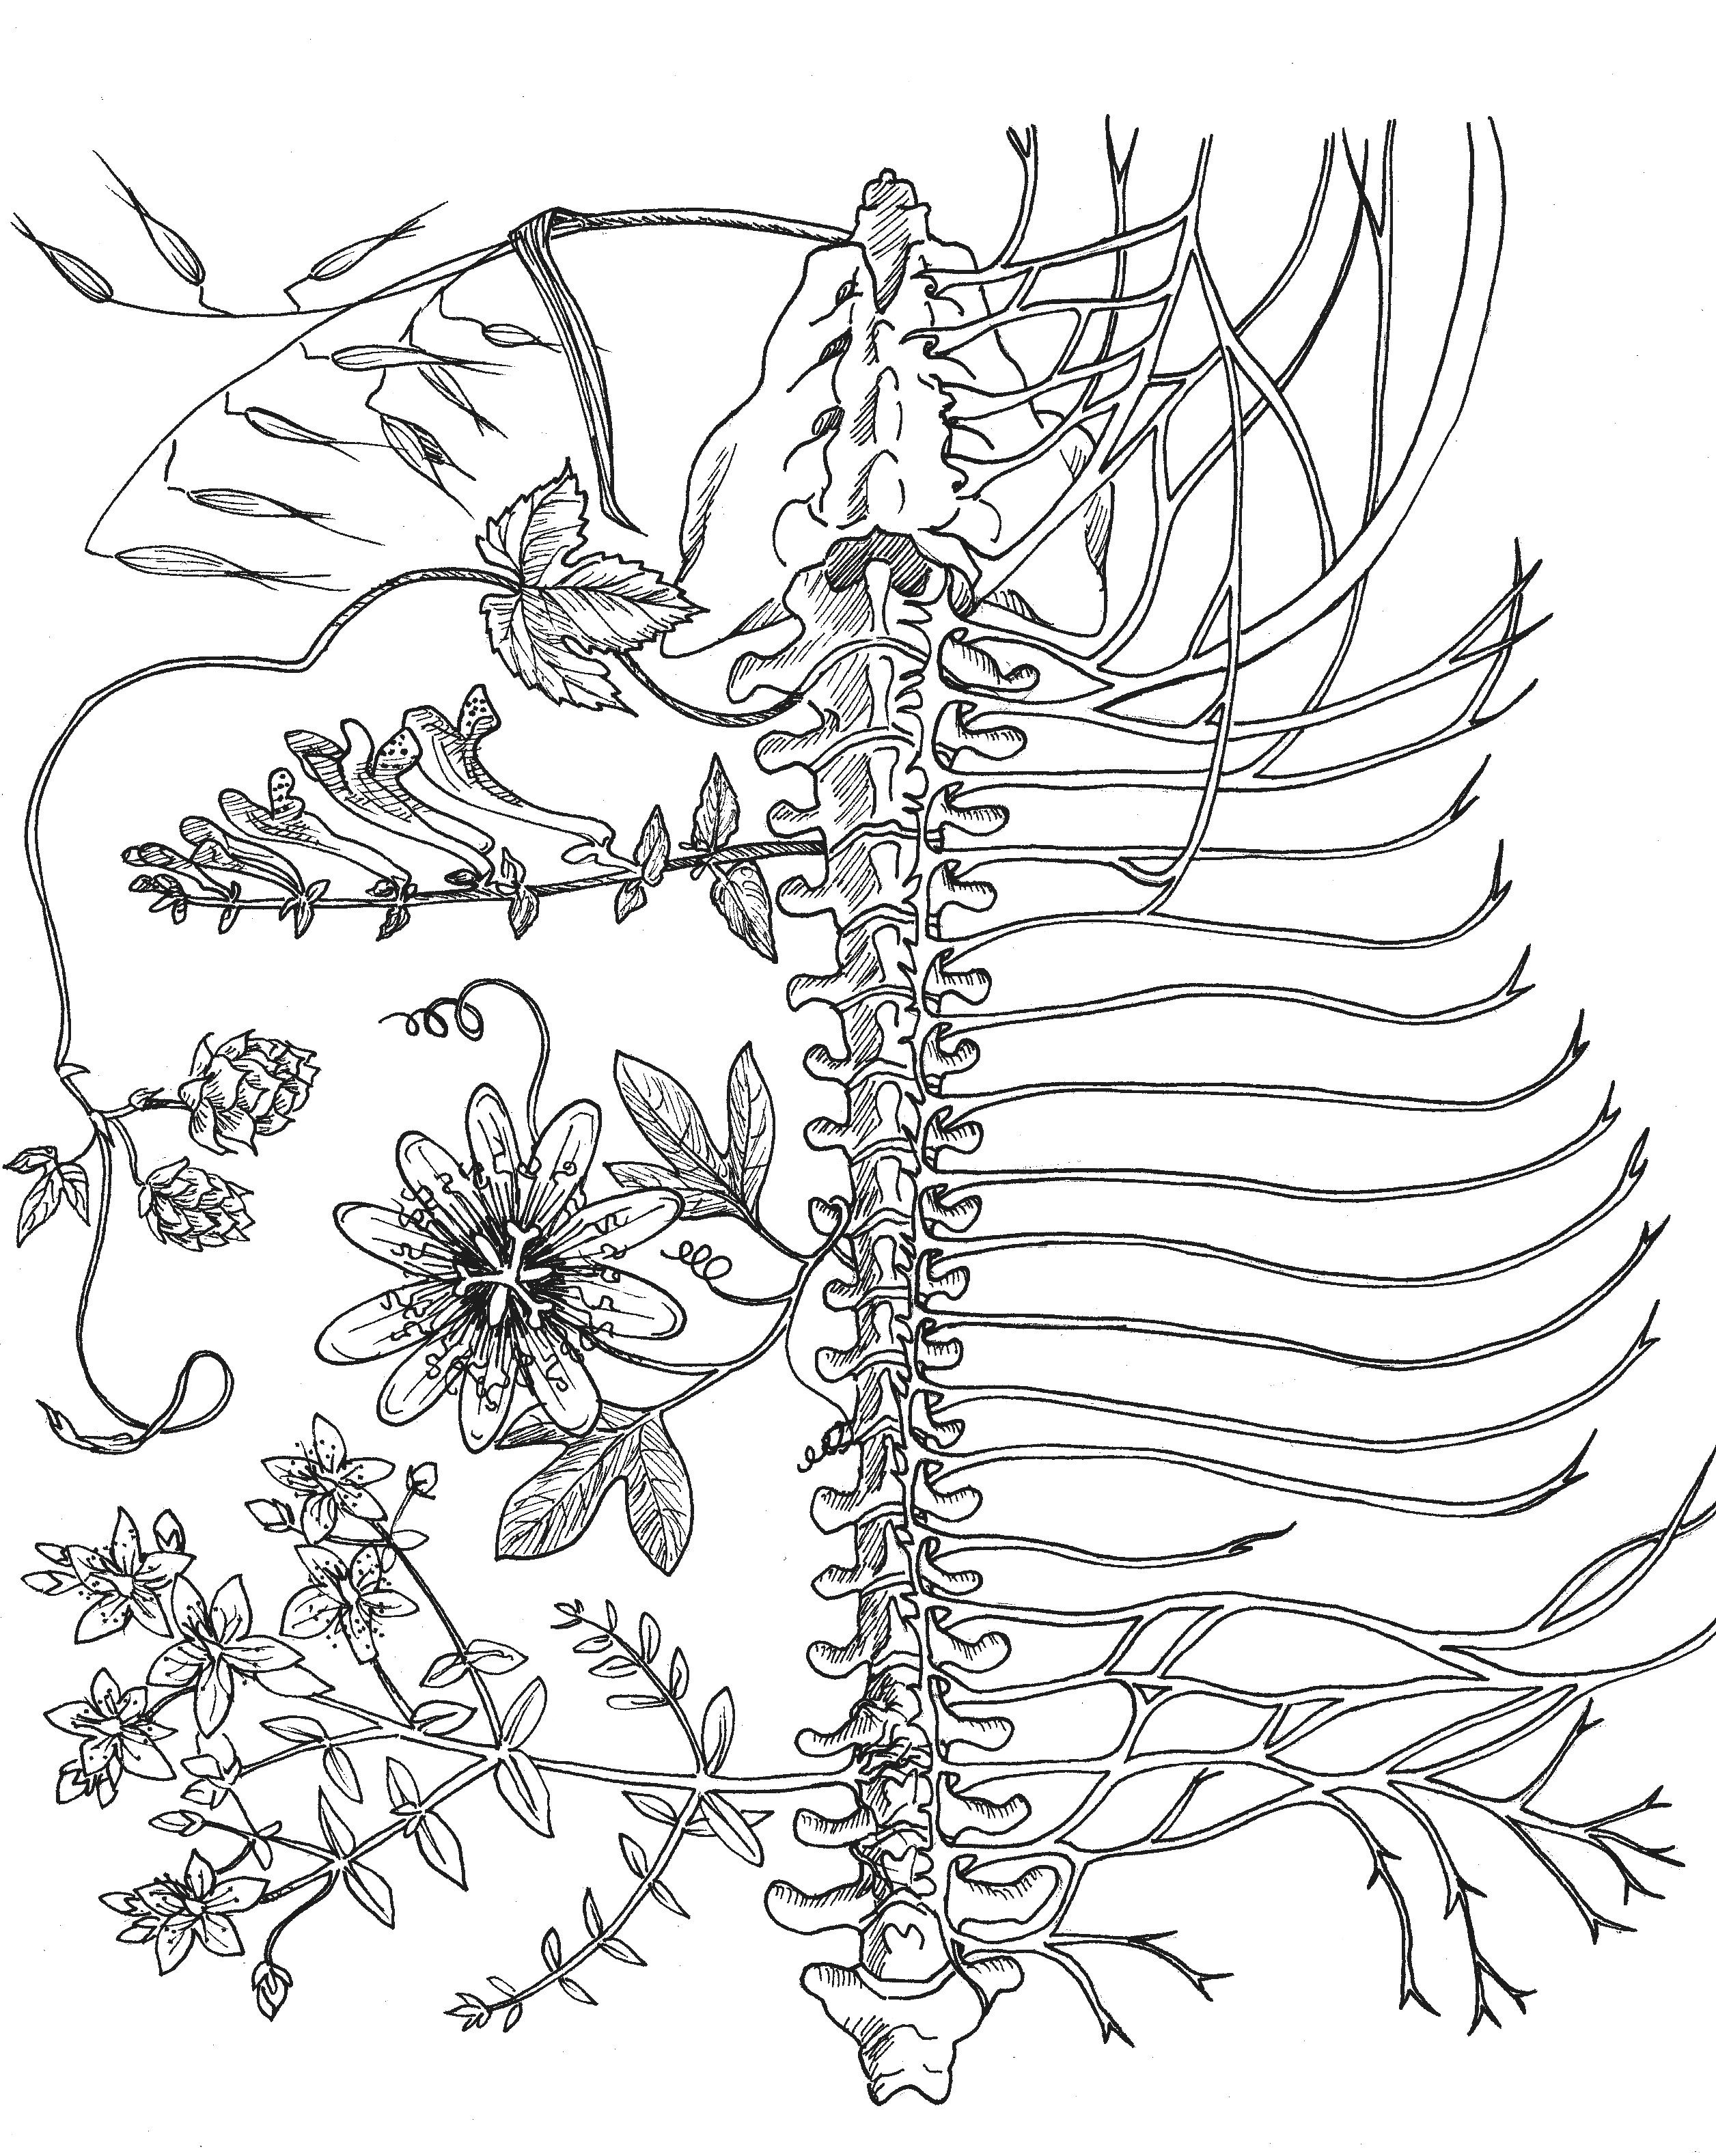 Nervous System Affinities Milky Oats Skullcap Hops Passionflower St John S Wort Herbpharm Art Herb Art Herbal Apothecary Chinese Herbal Medicine